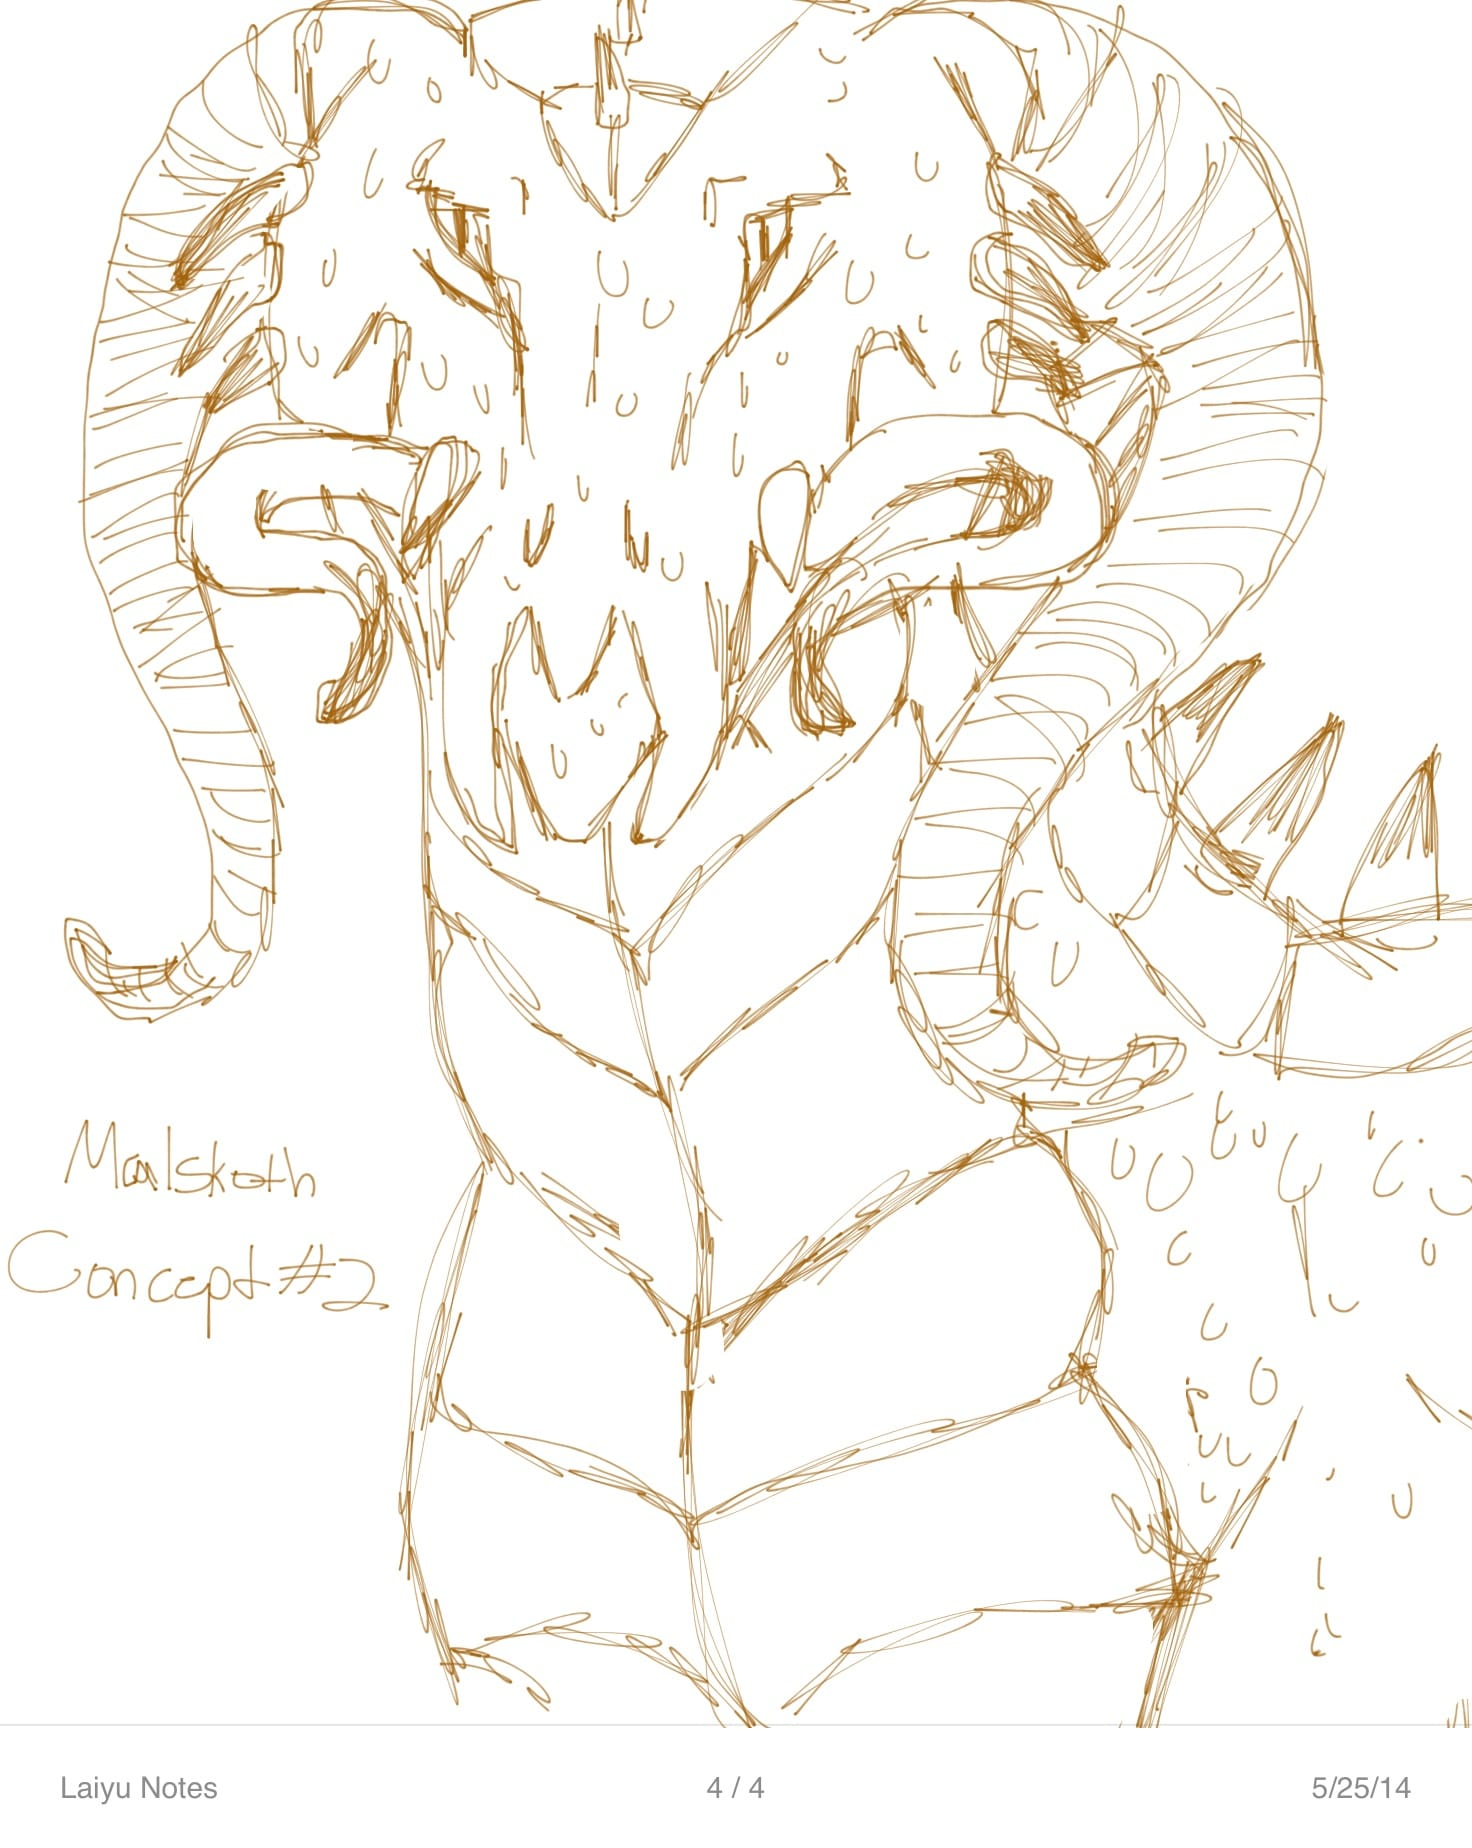 Malskoth (villain) Concept #2